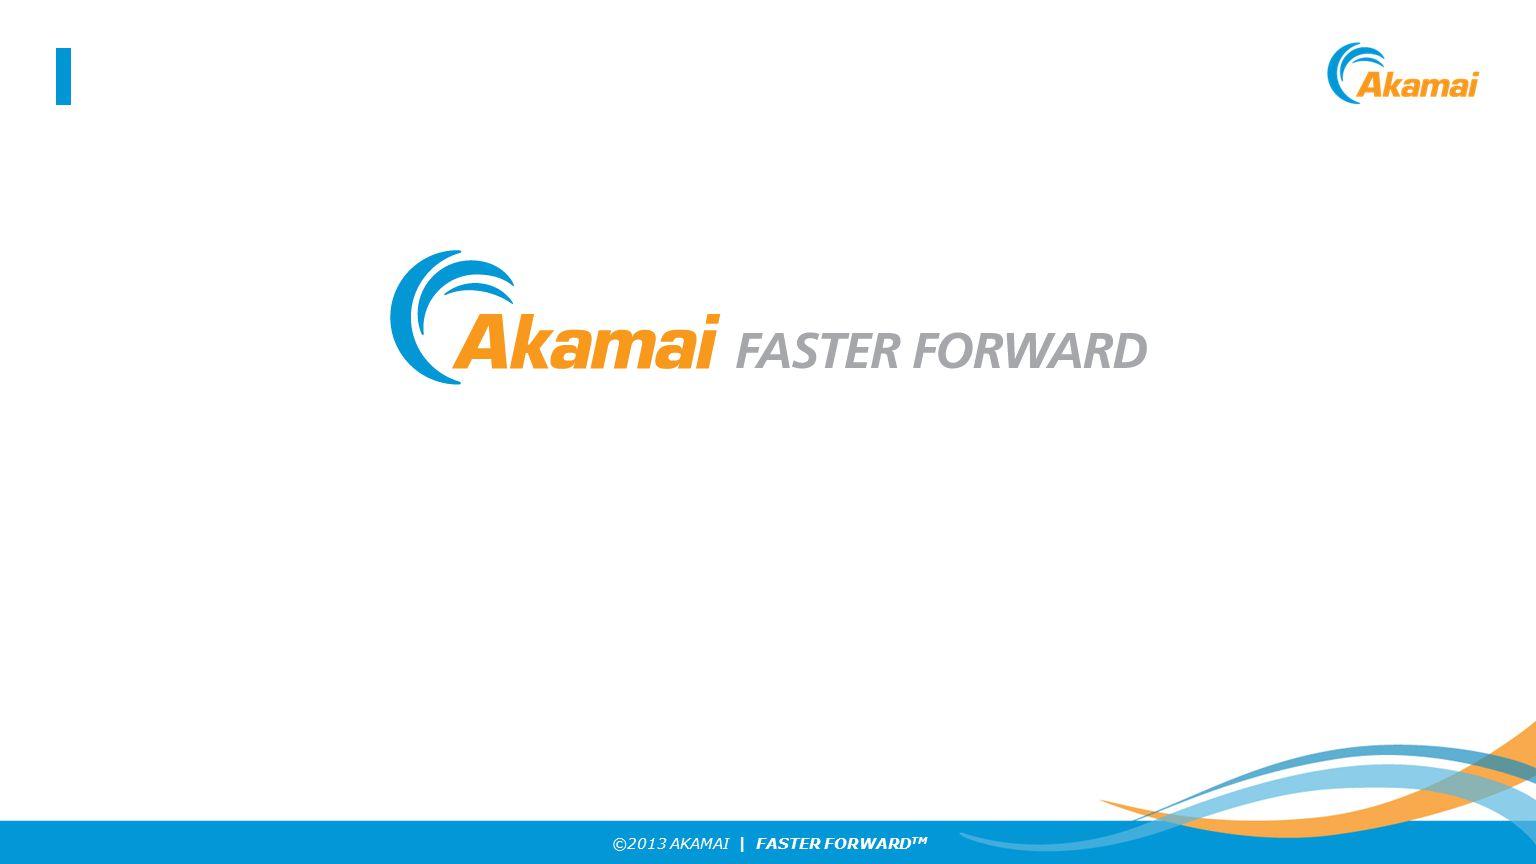 ©2013 AKAMAI | FASTER FORWARD TM